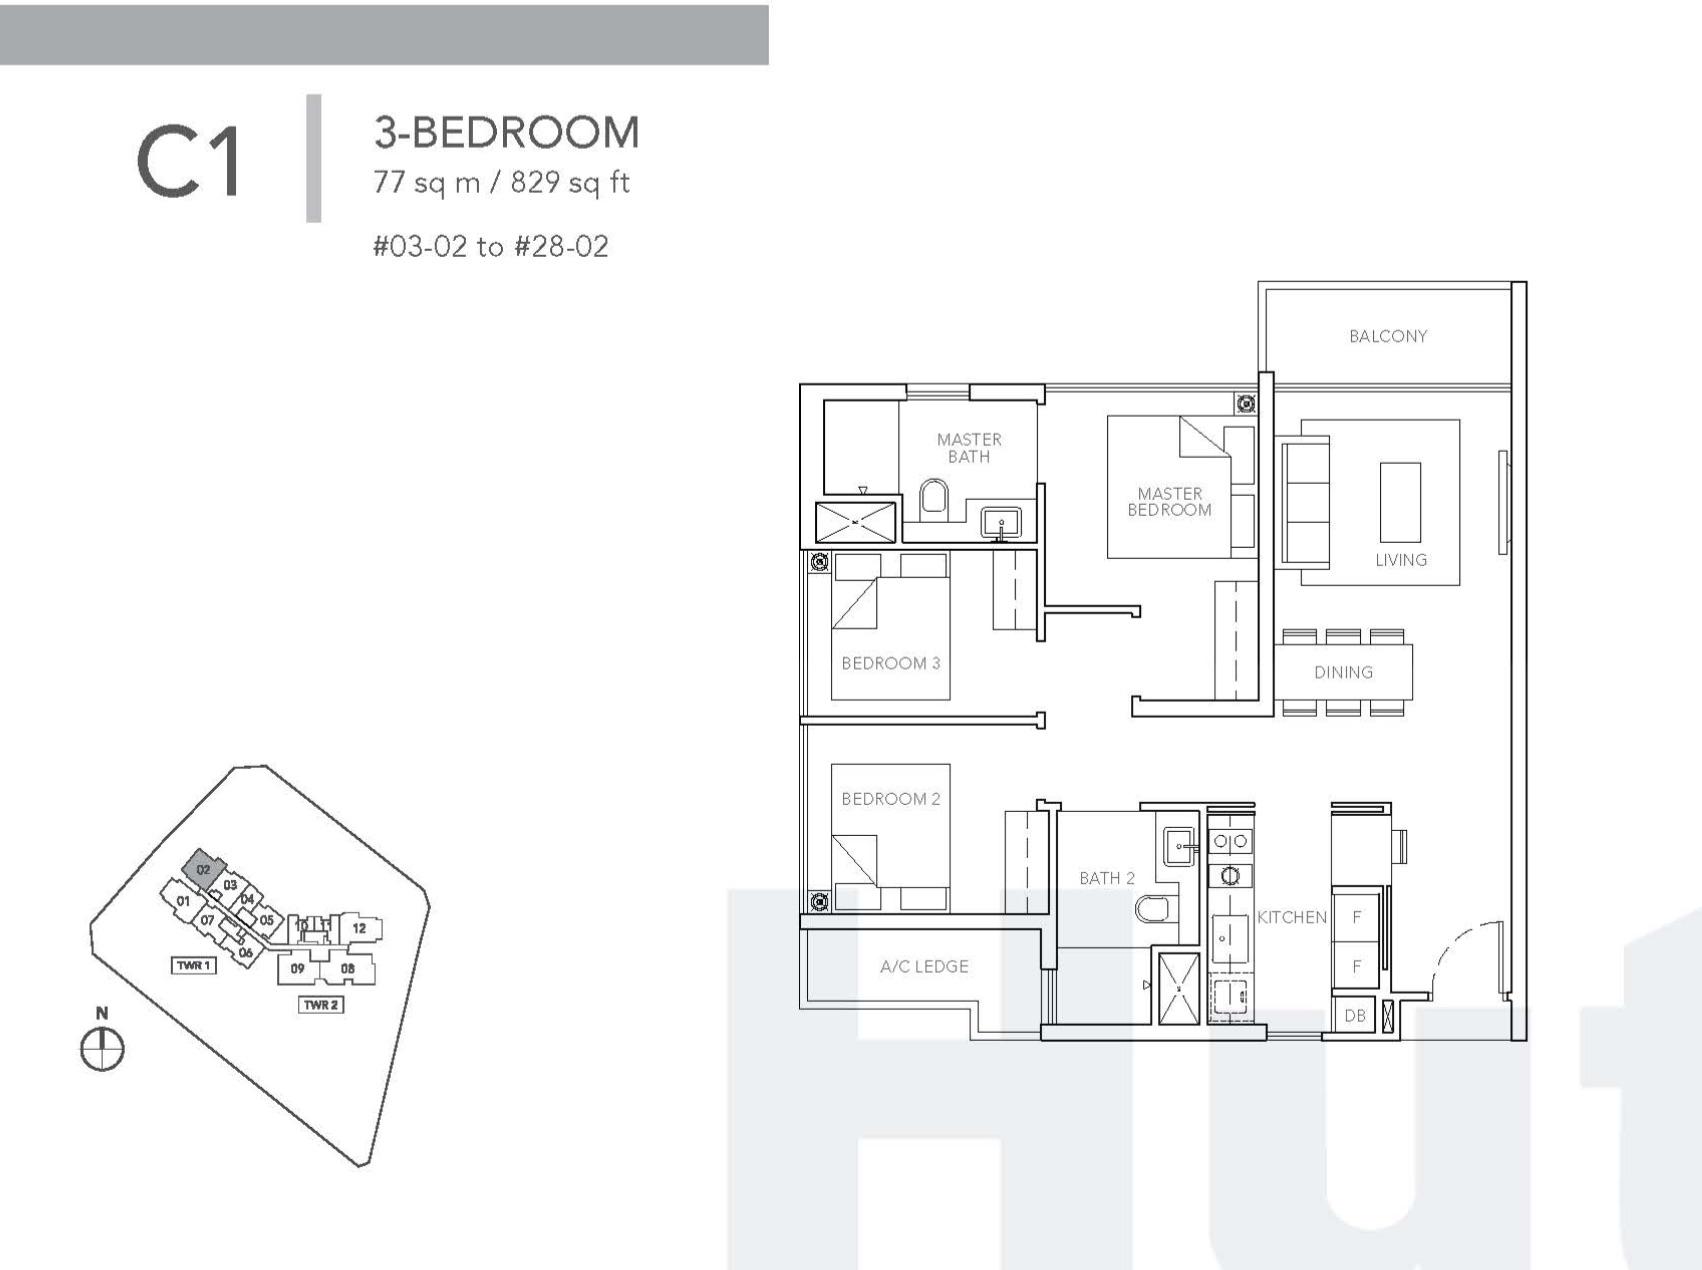 sturdee residences showflat viewing 6100 8160 starbuy